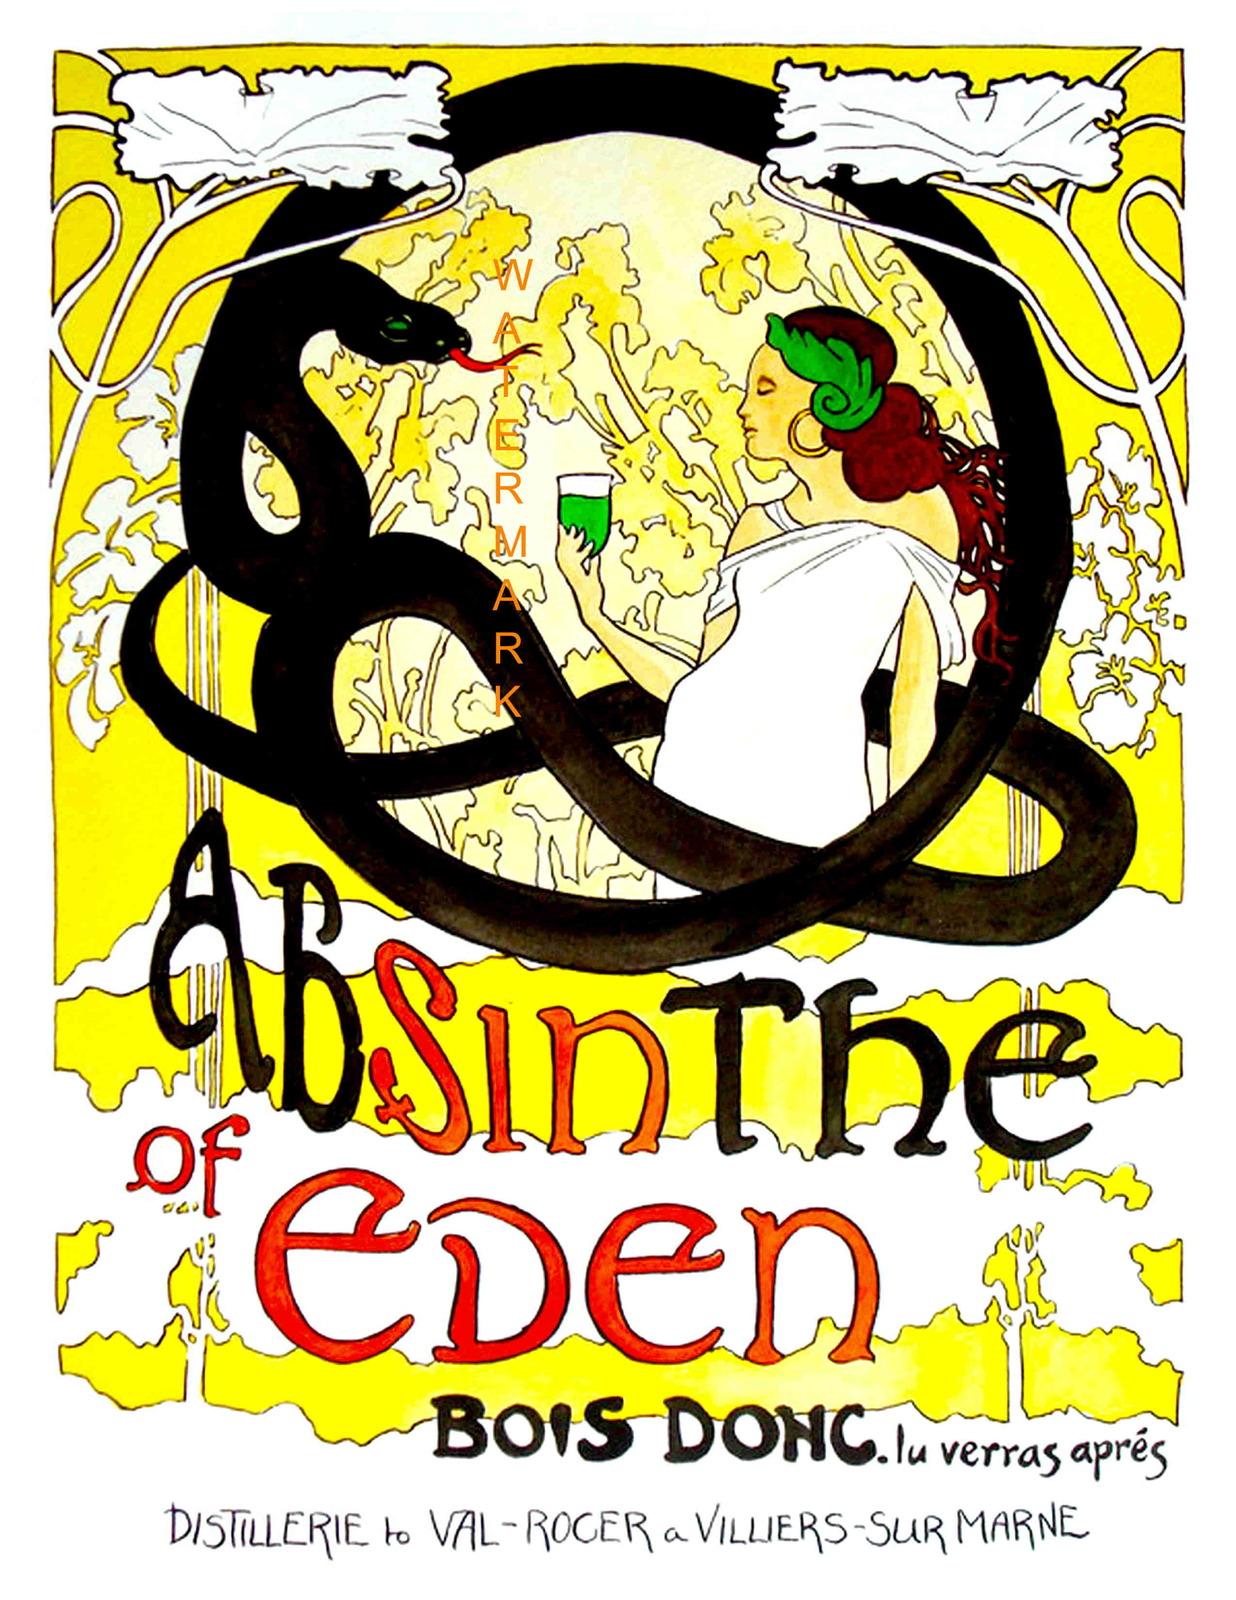 Polly absinthe poster eden snake